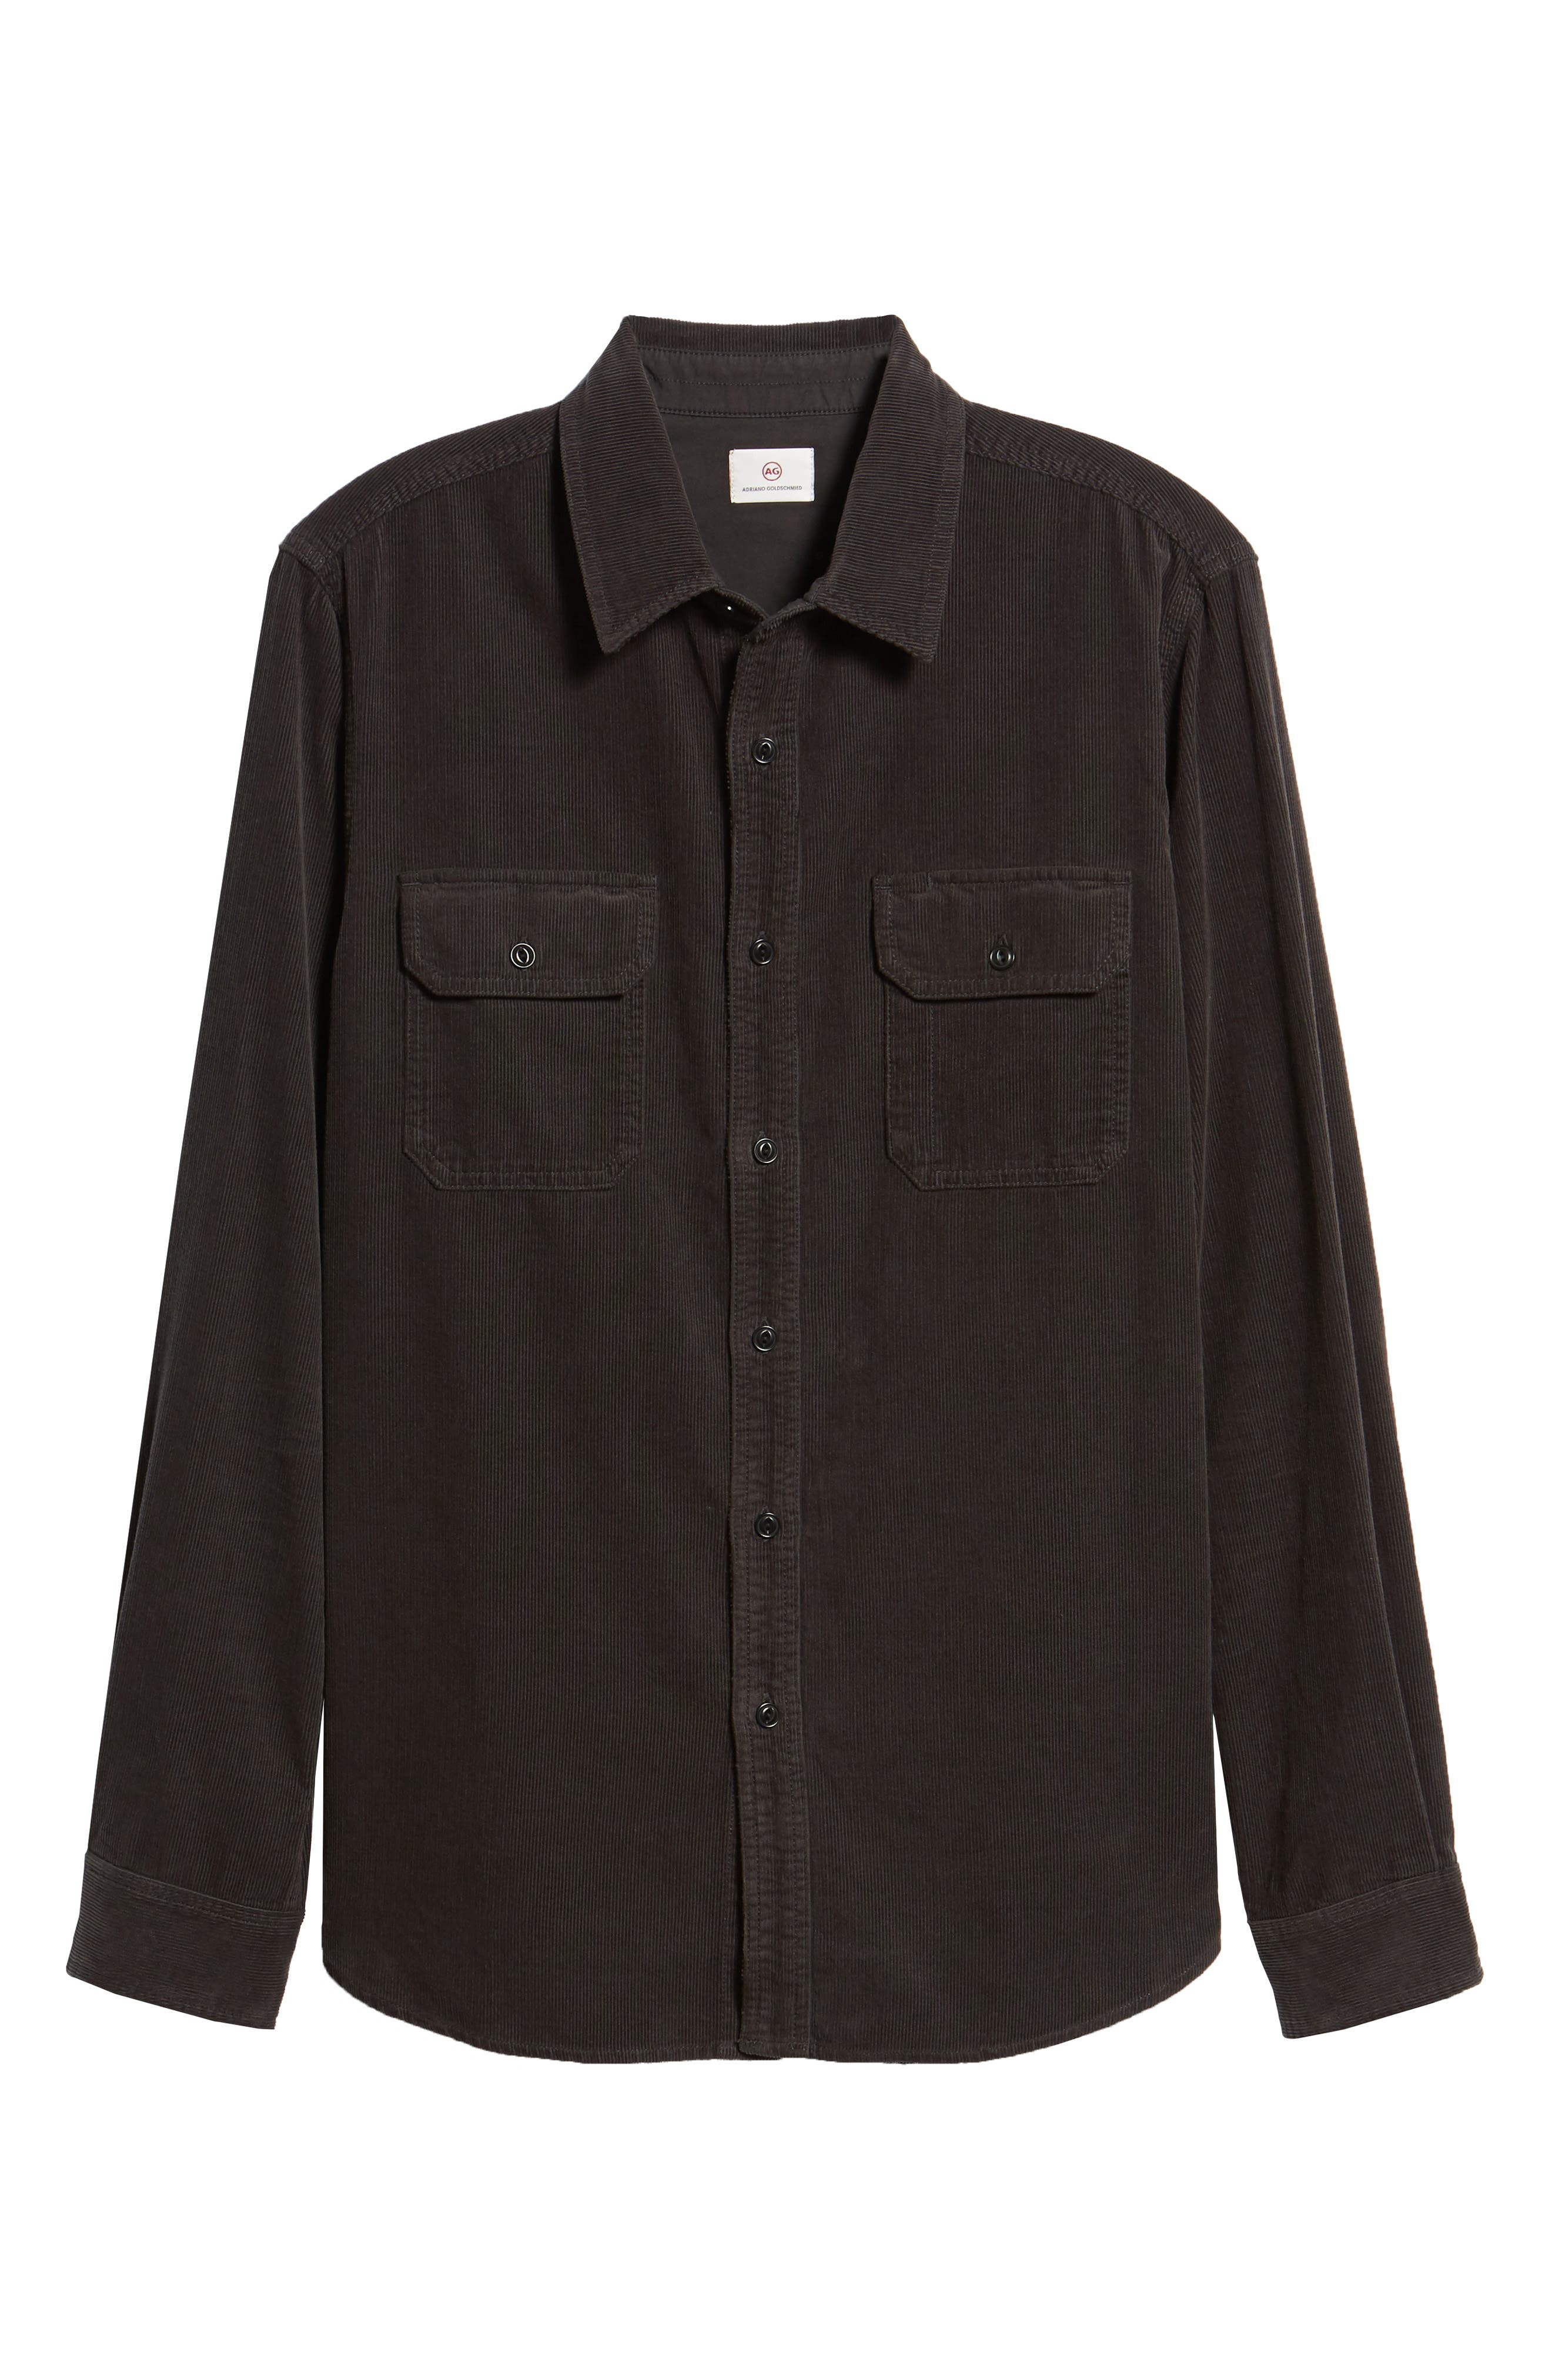 Benning Slim Fit Utility Shirt,                             Alternate thumbnail 5, color,                             GRAY STONE